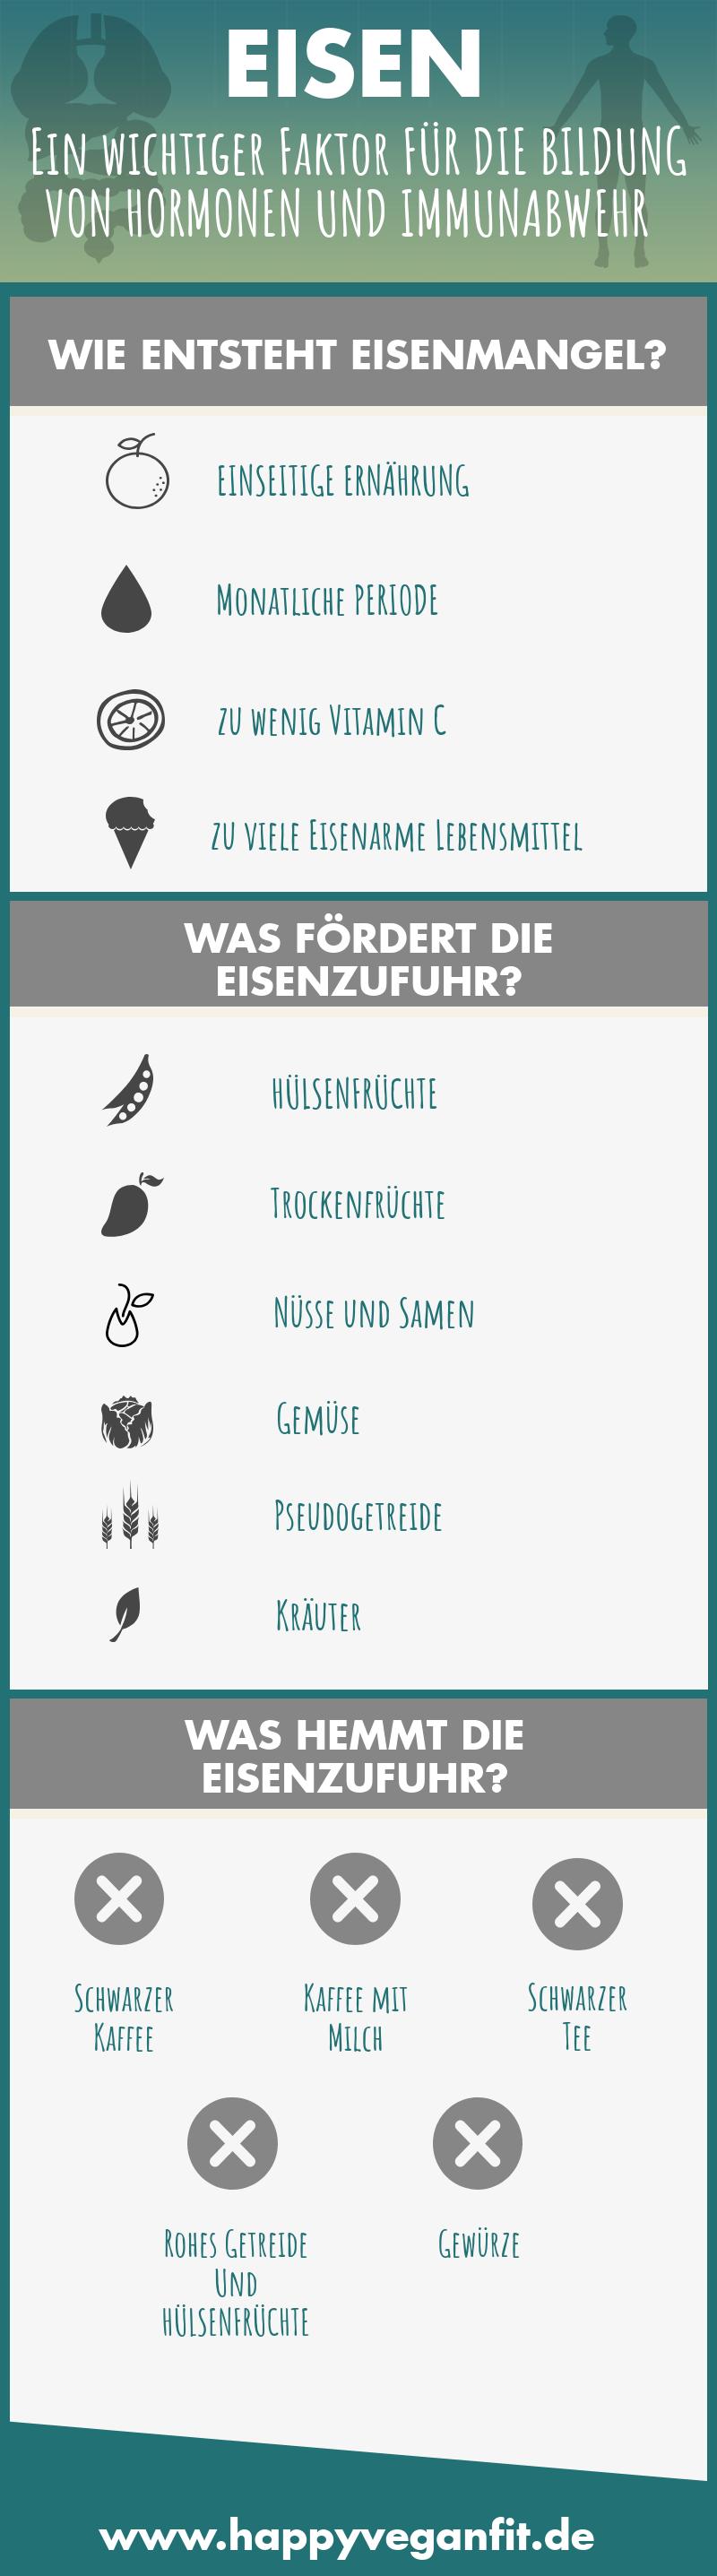 eisen vegan infografik 1